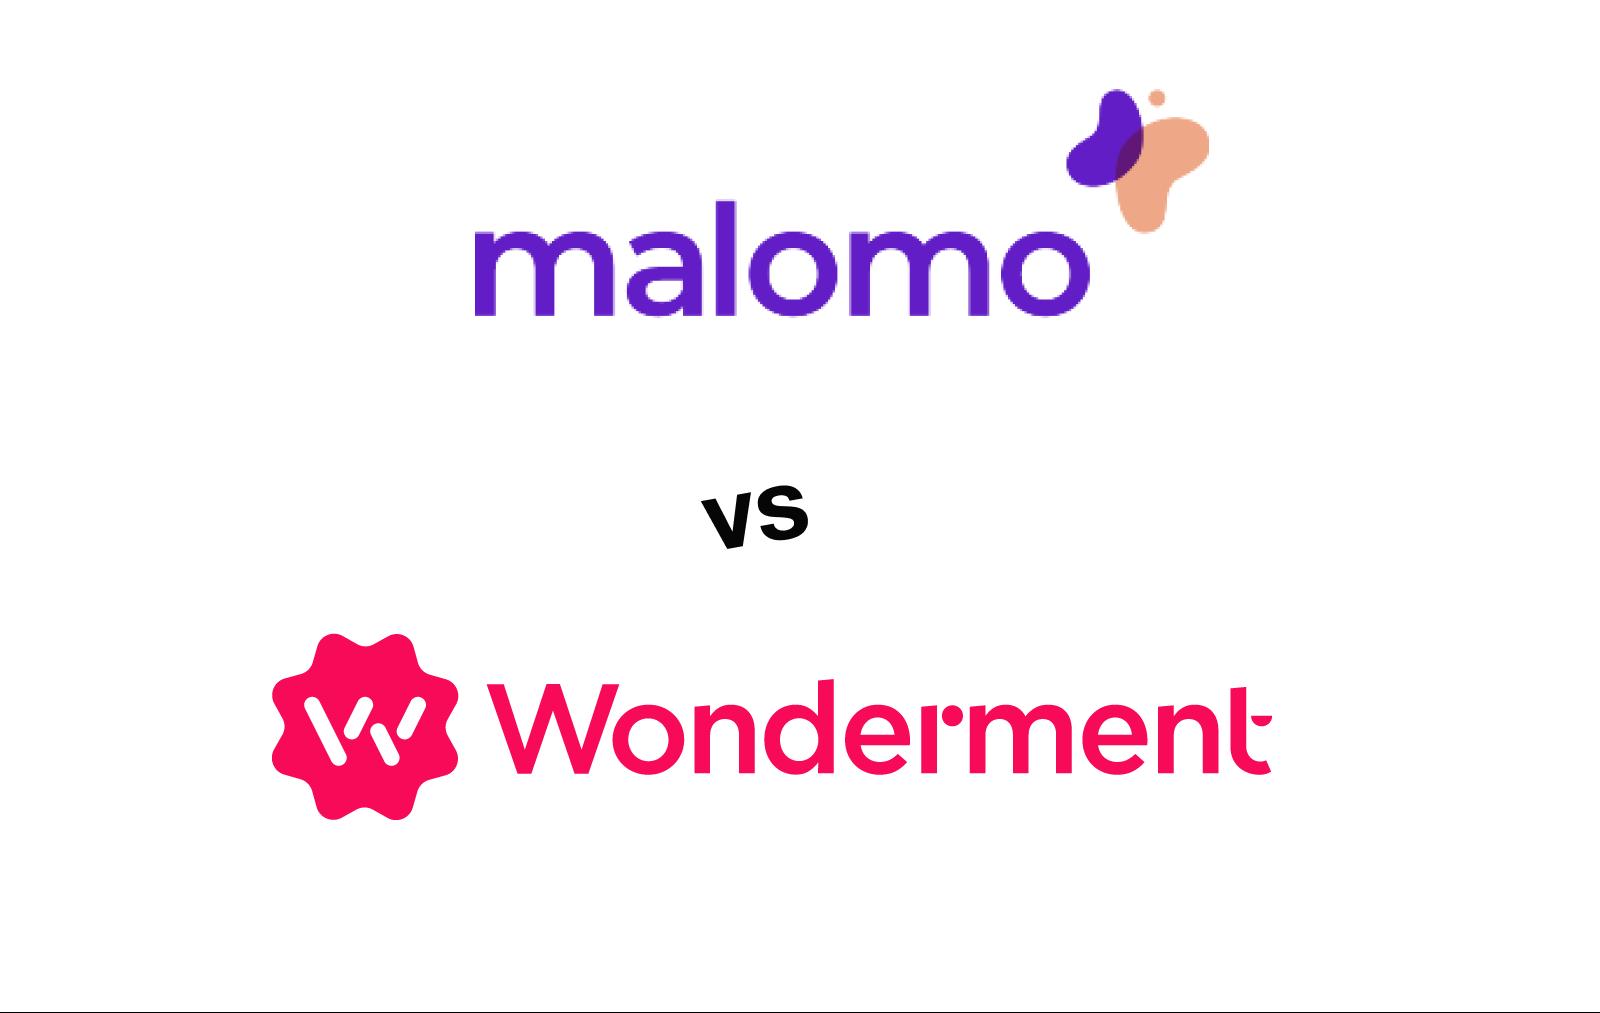 Malomo vs Wonderment